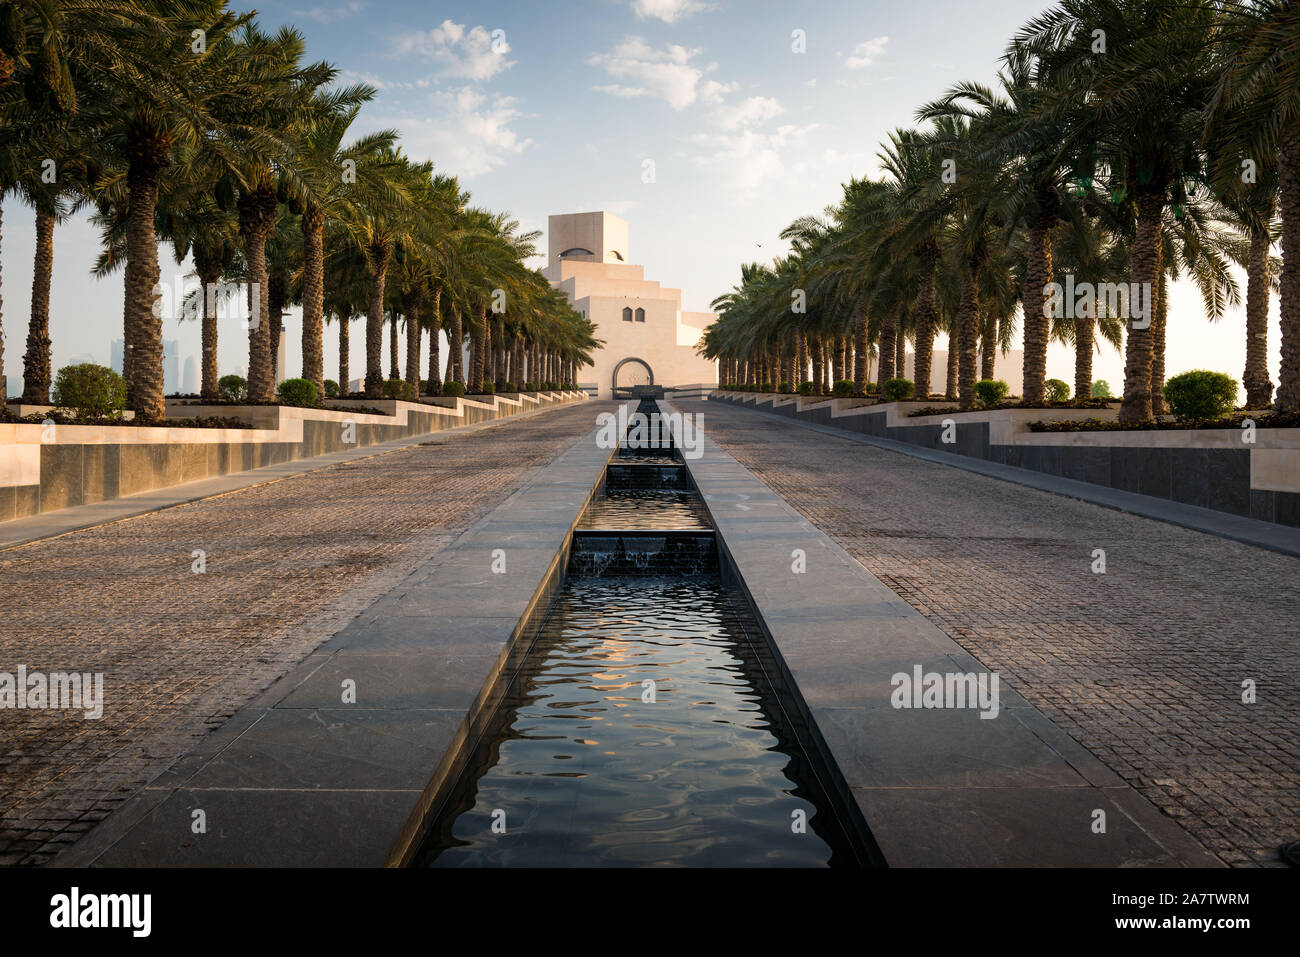 The Museum of Islamic Art in Doha, Qatar. Stock Photo